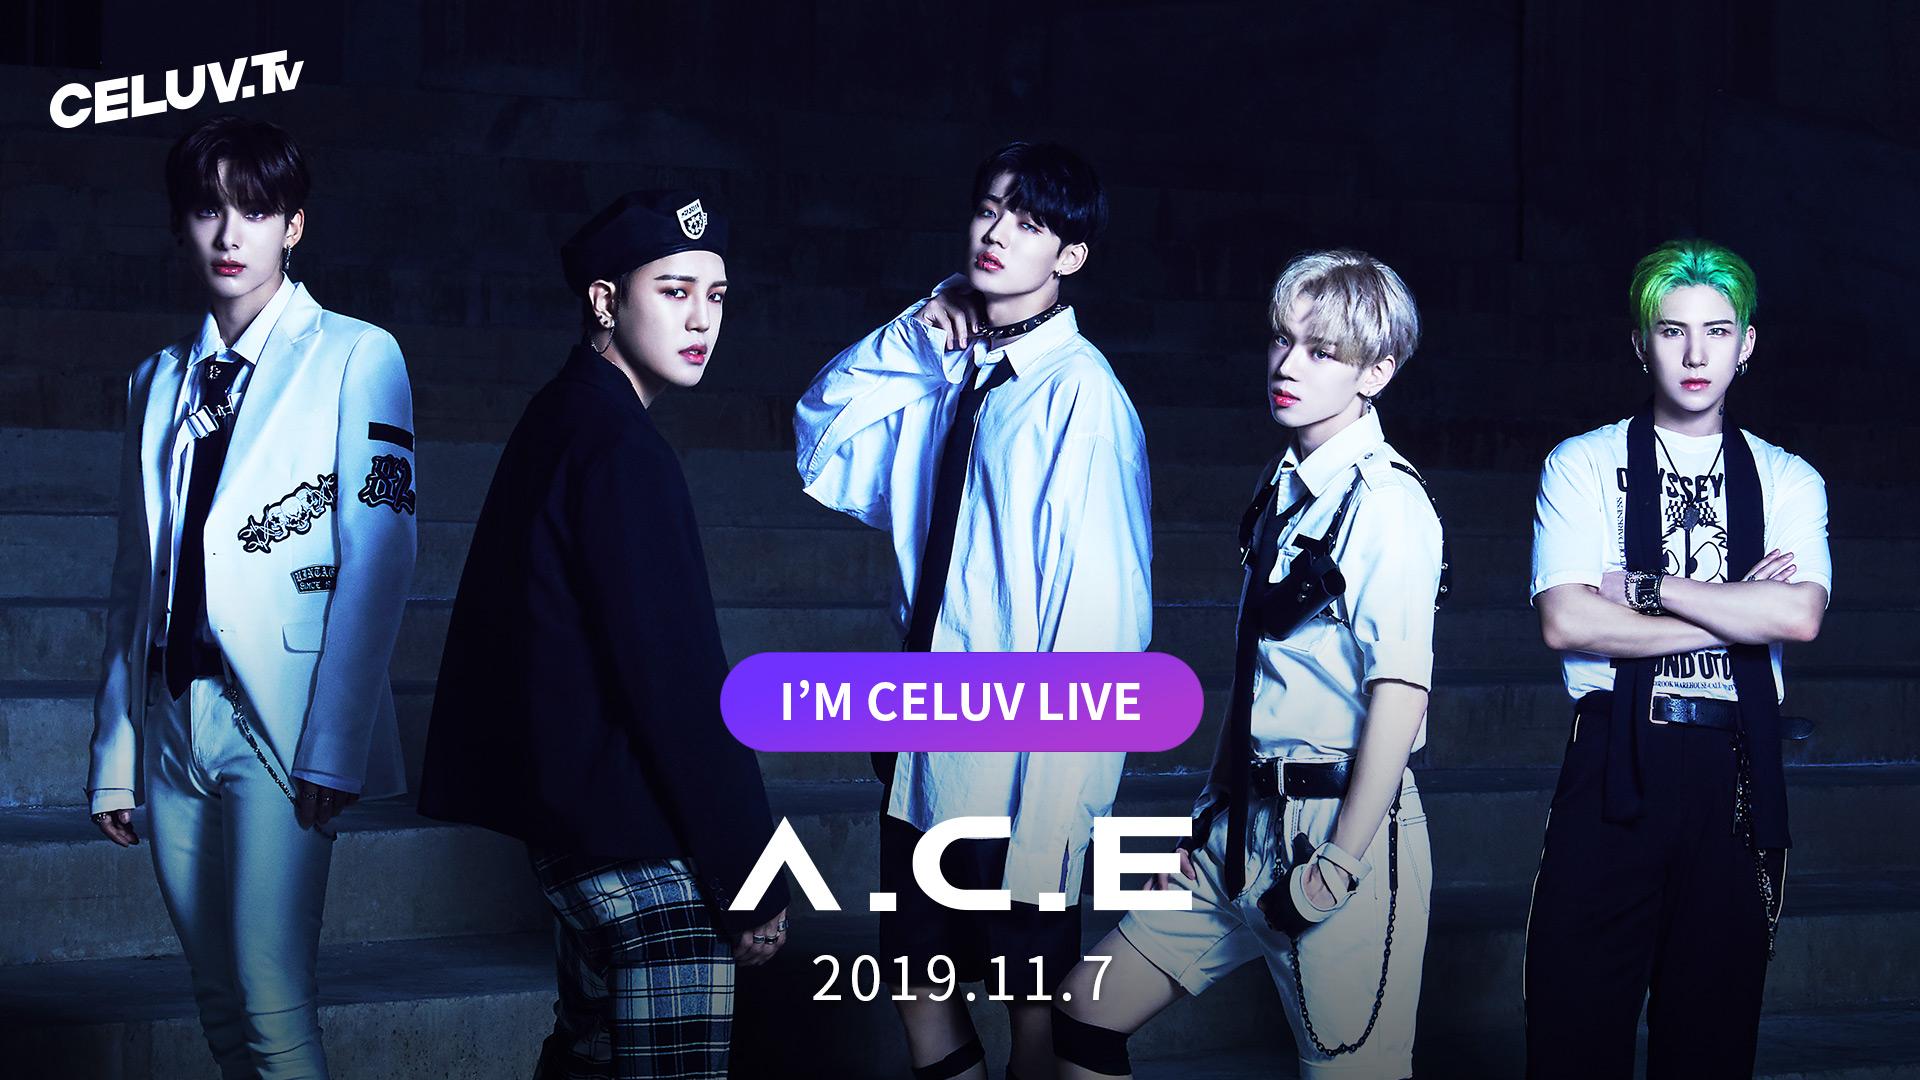 [Replay][I'm Celuv] A.C.E(에이스), 우린 아임셀럽~ 가자! 가자! (Celuv.TV)